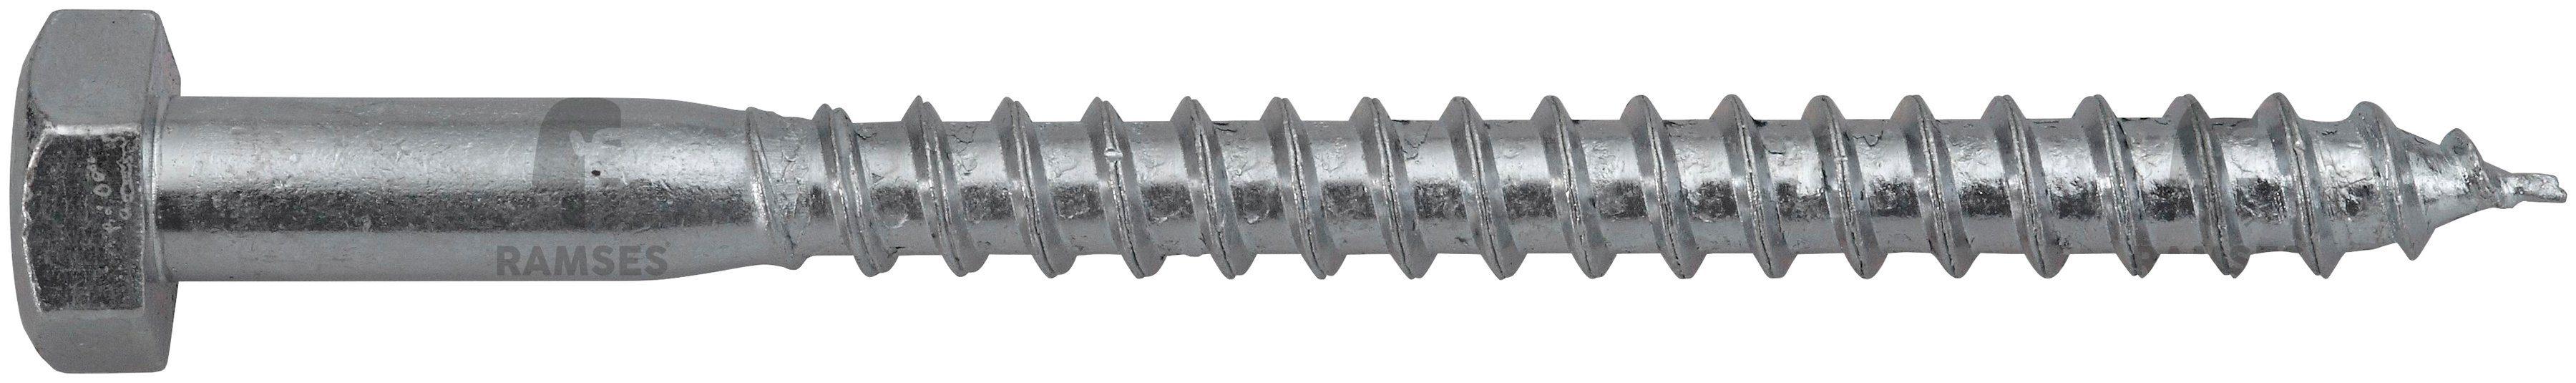 RAMSES Schrauben , Sechskant-Holzschraube 12 x 220 mm 25 Stk.